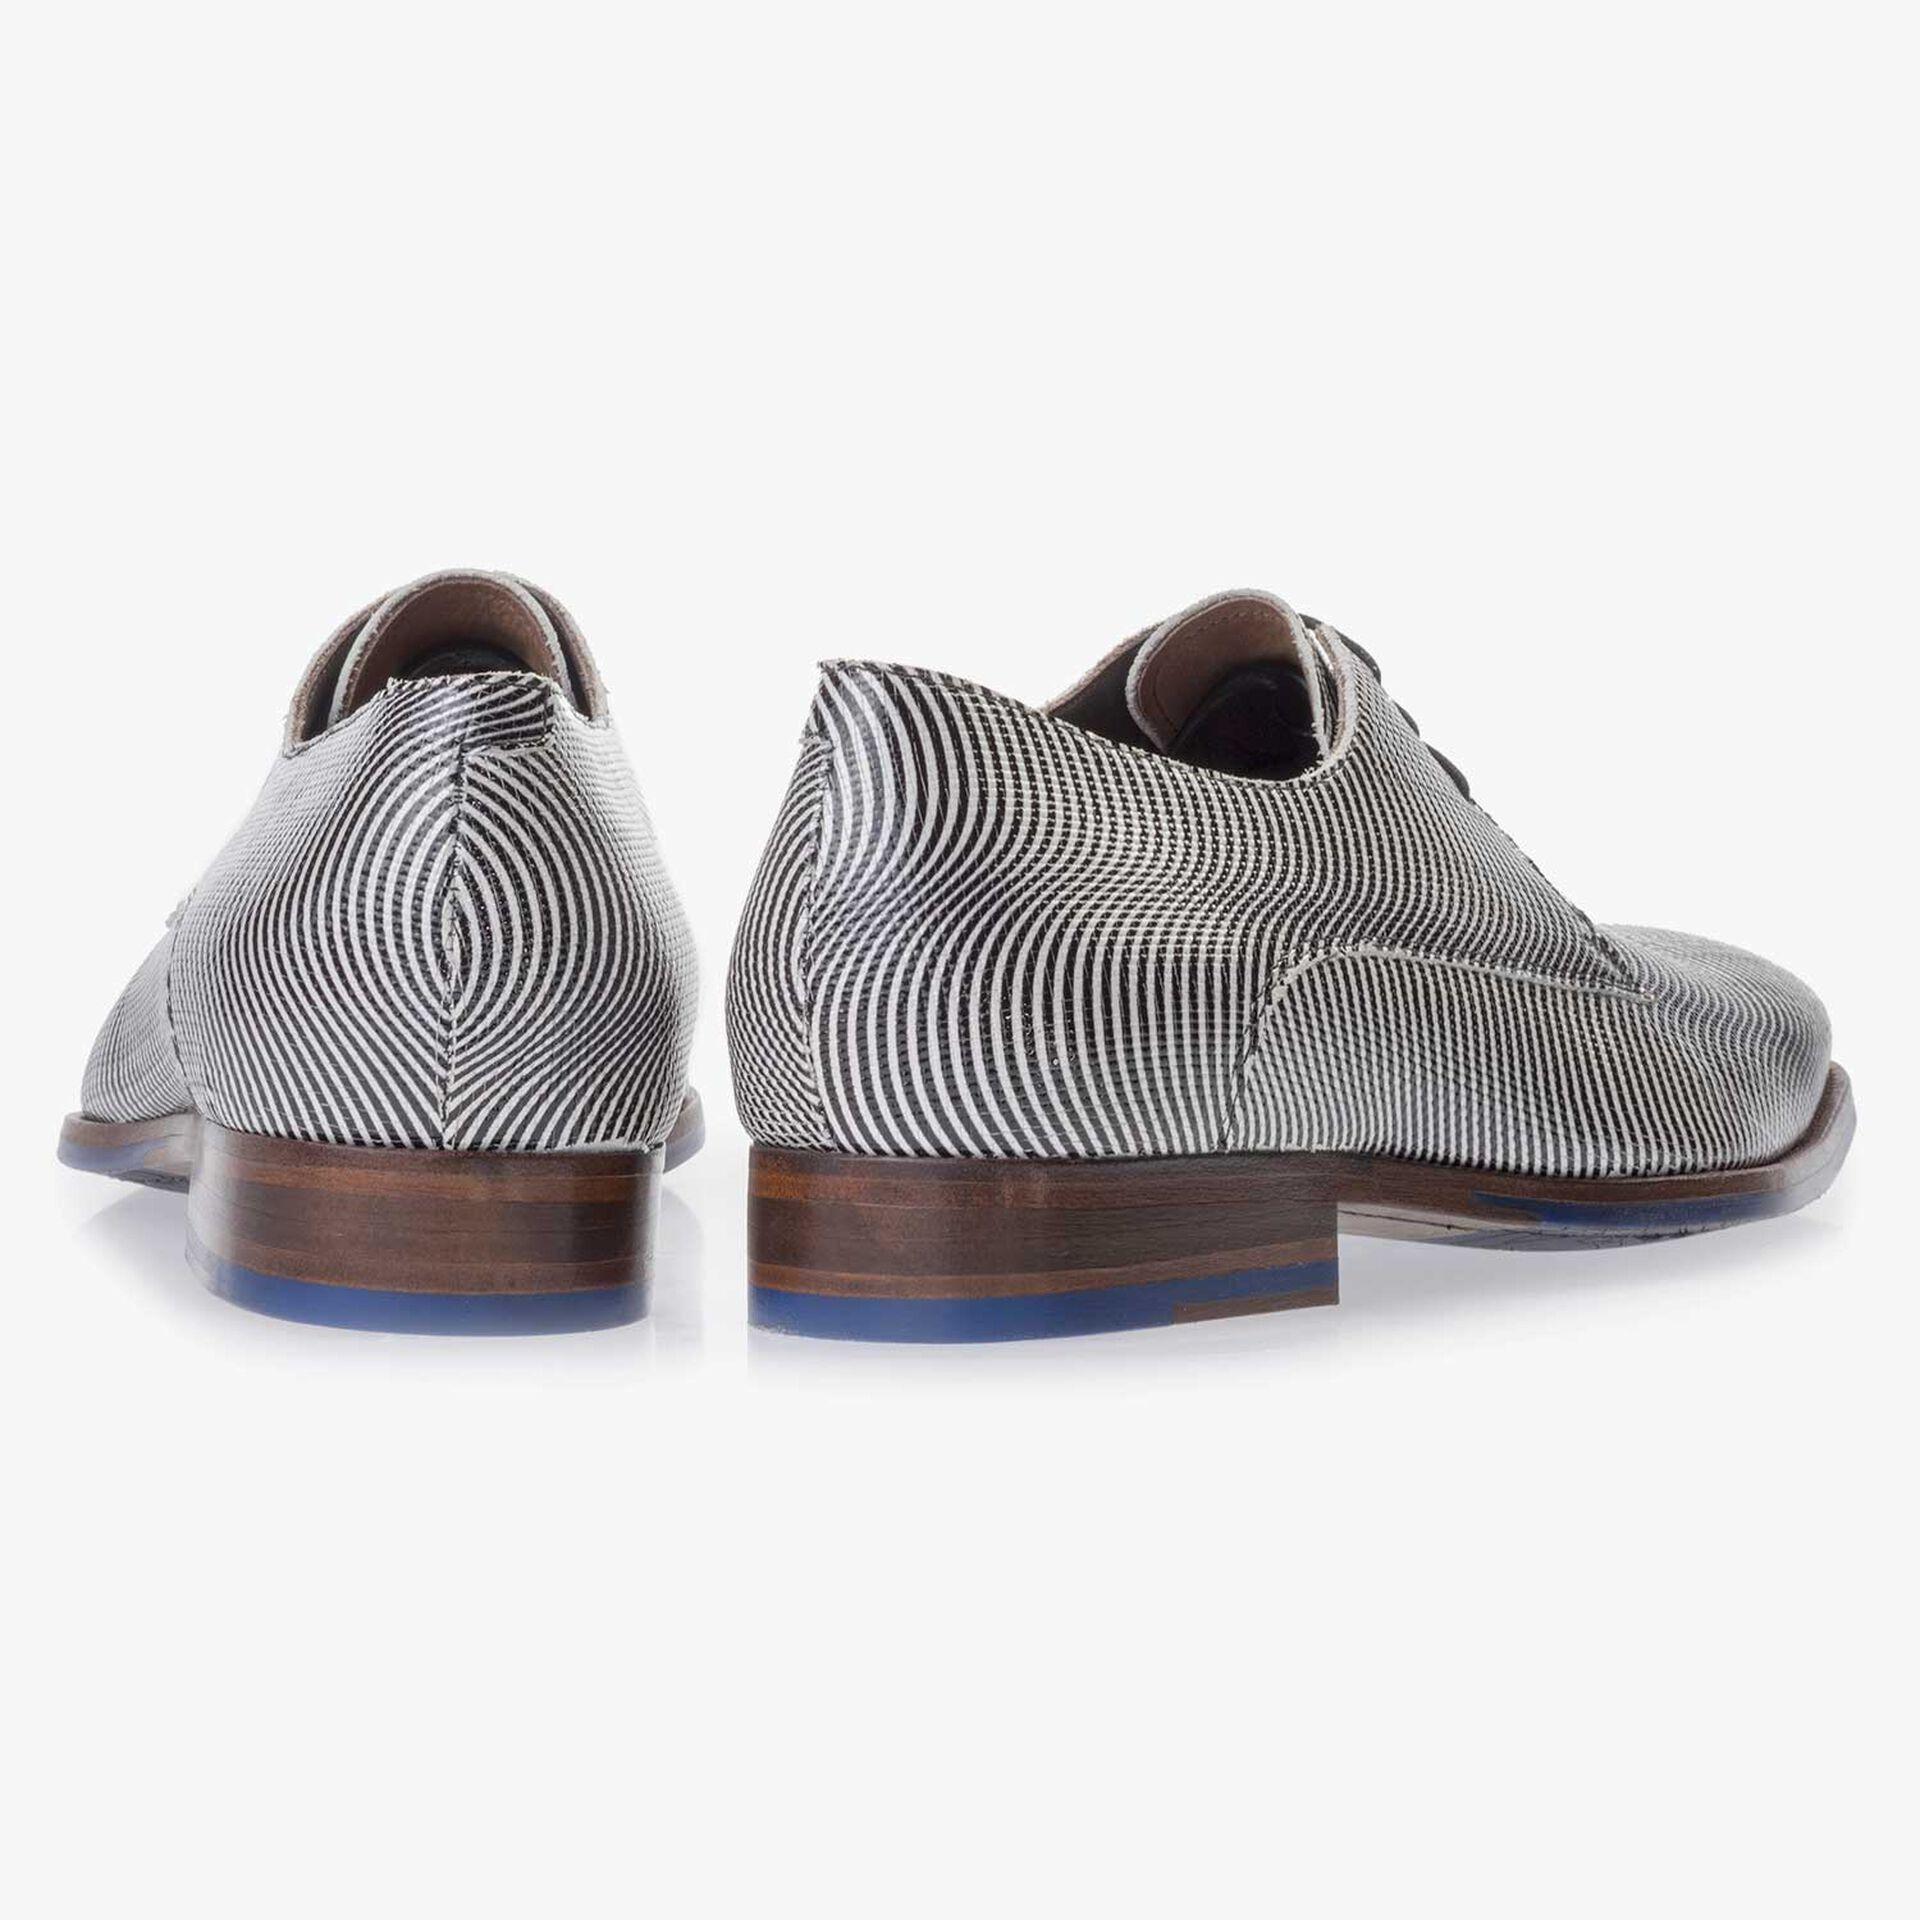 Black/White, patent leather lace shoe